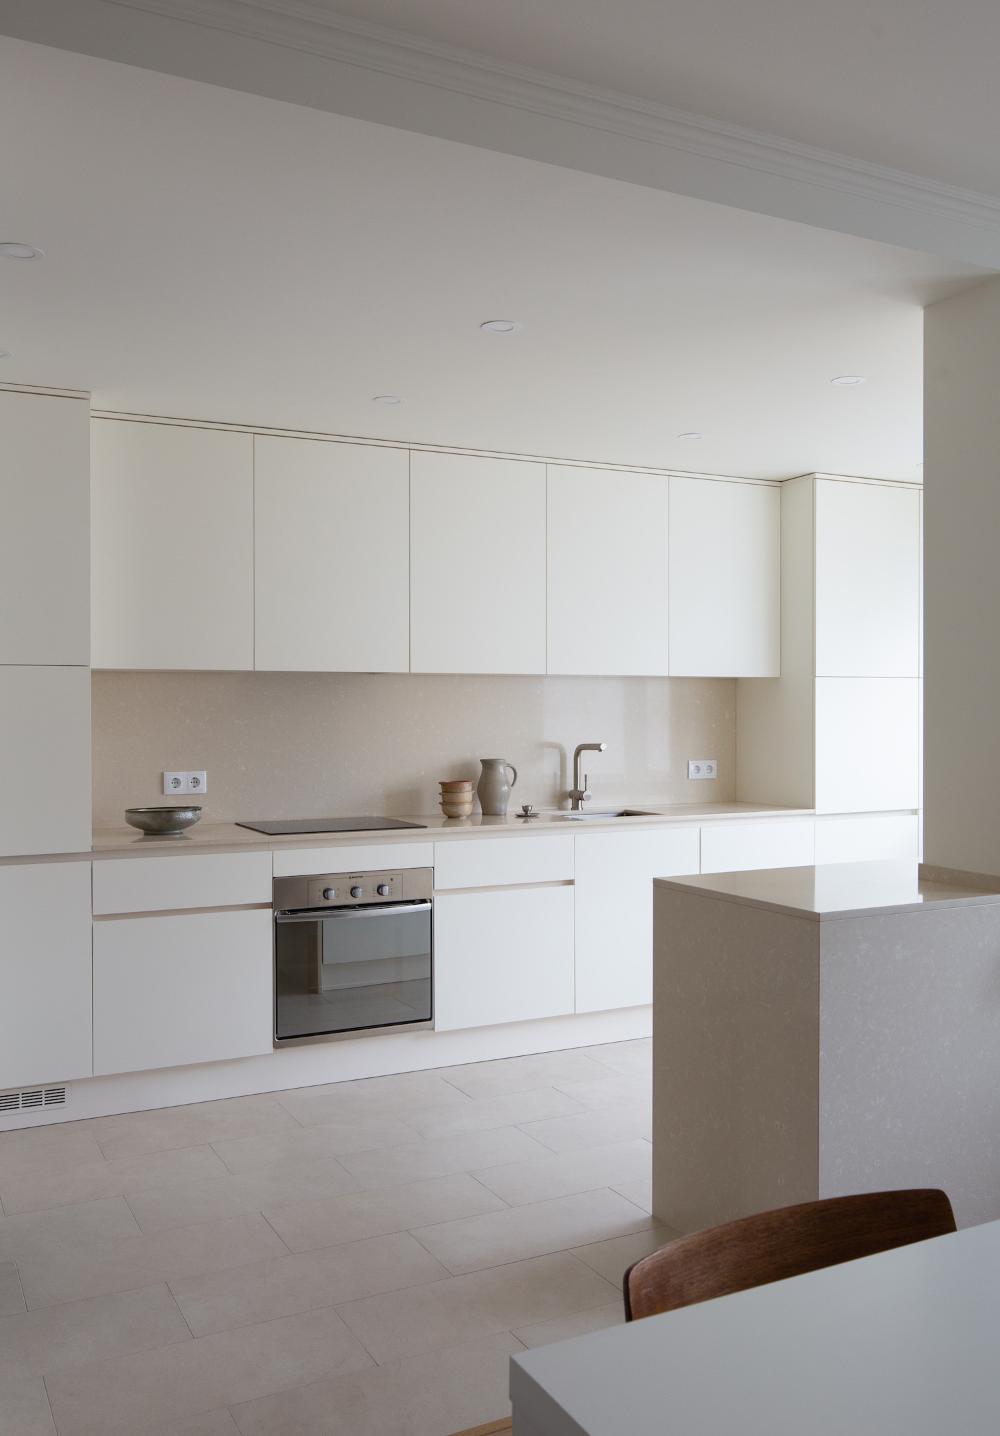 Carnide Apartment Minimal Kitchen Design Modern Kitchen Design Minimalist Kitchen Design